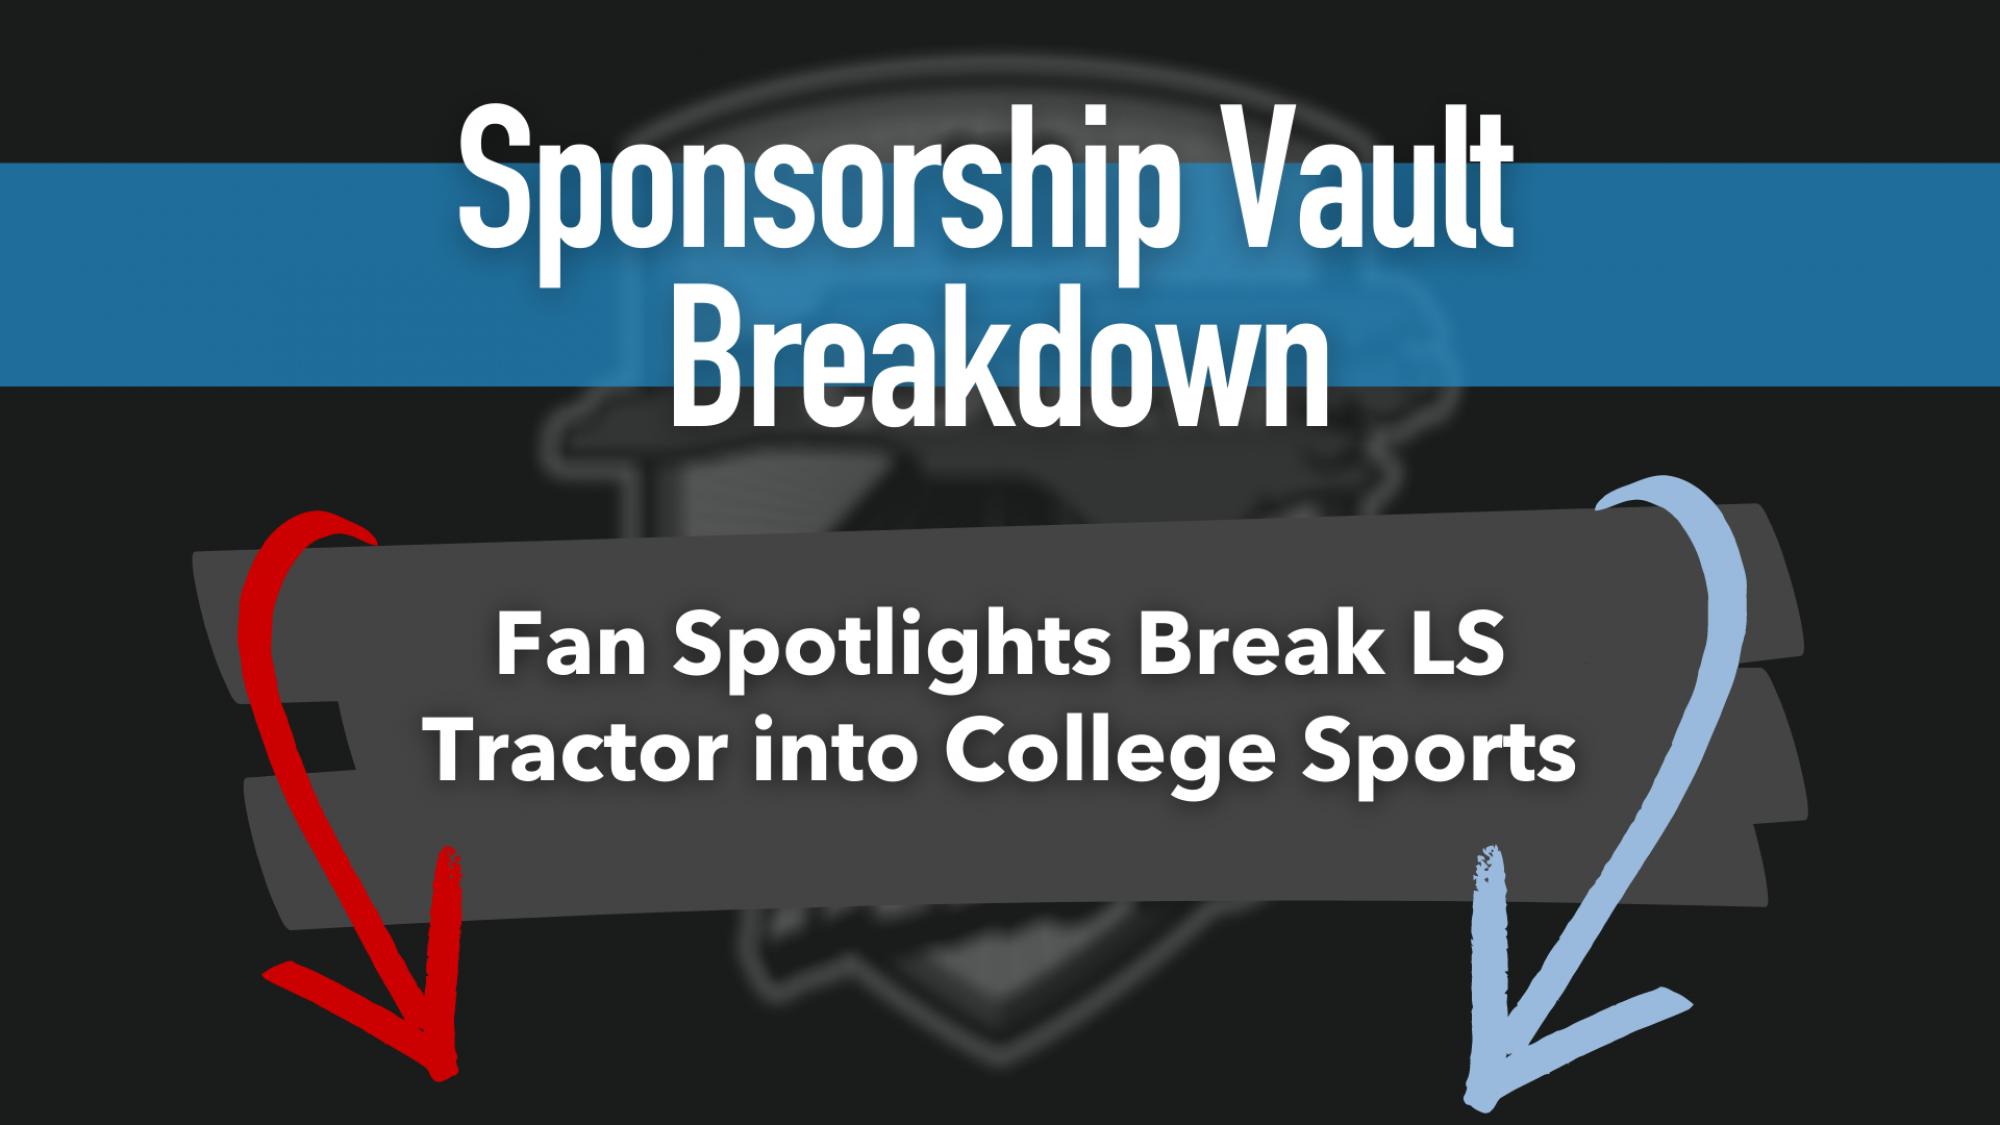 LS Tractor Sponsorship at NC State and University of North Carolina